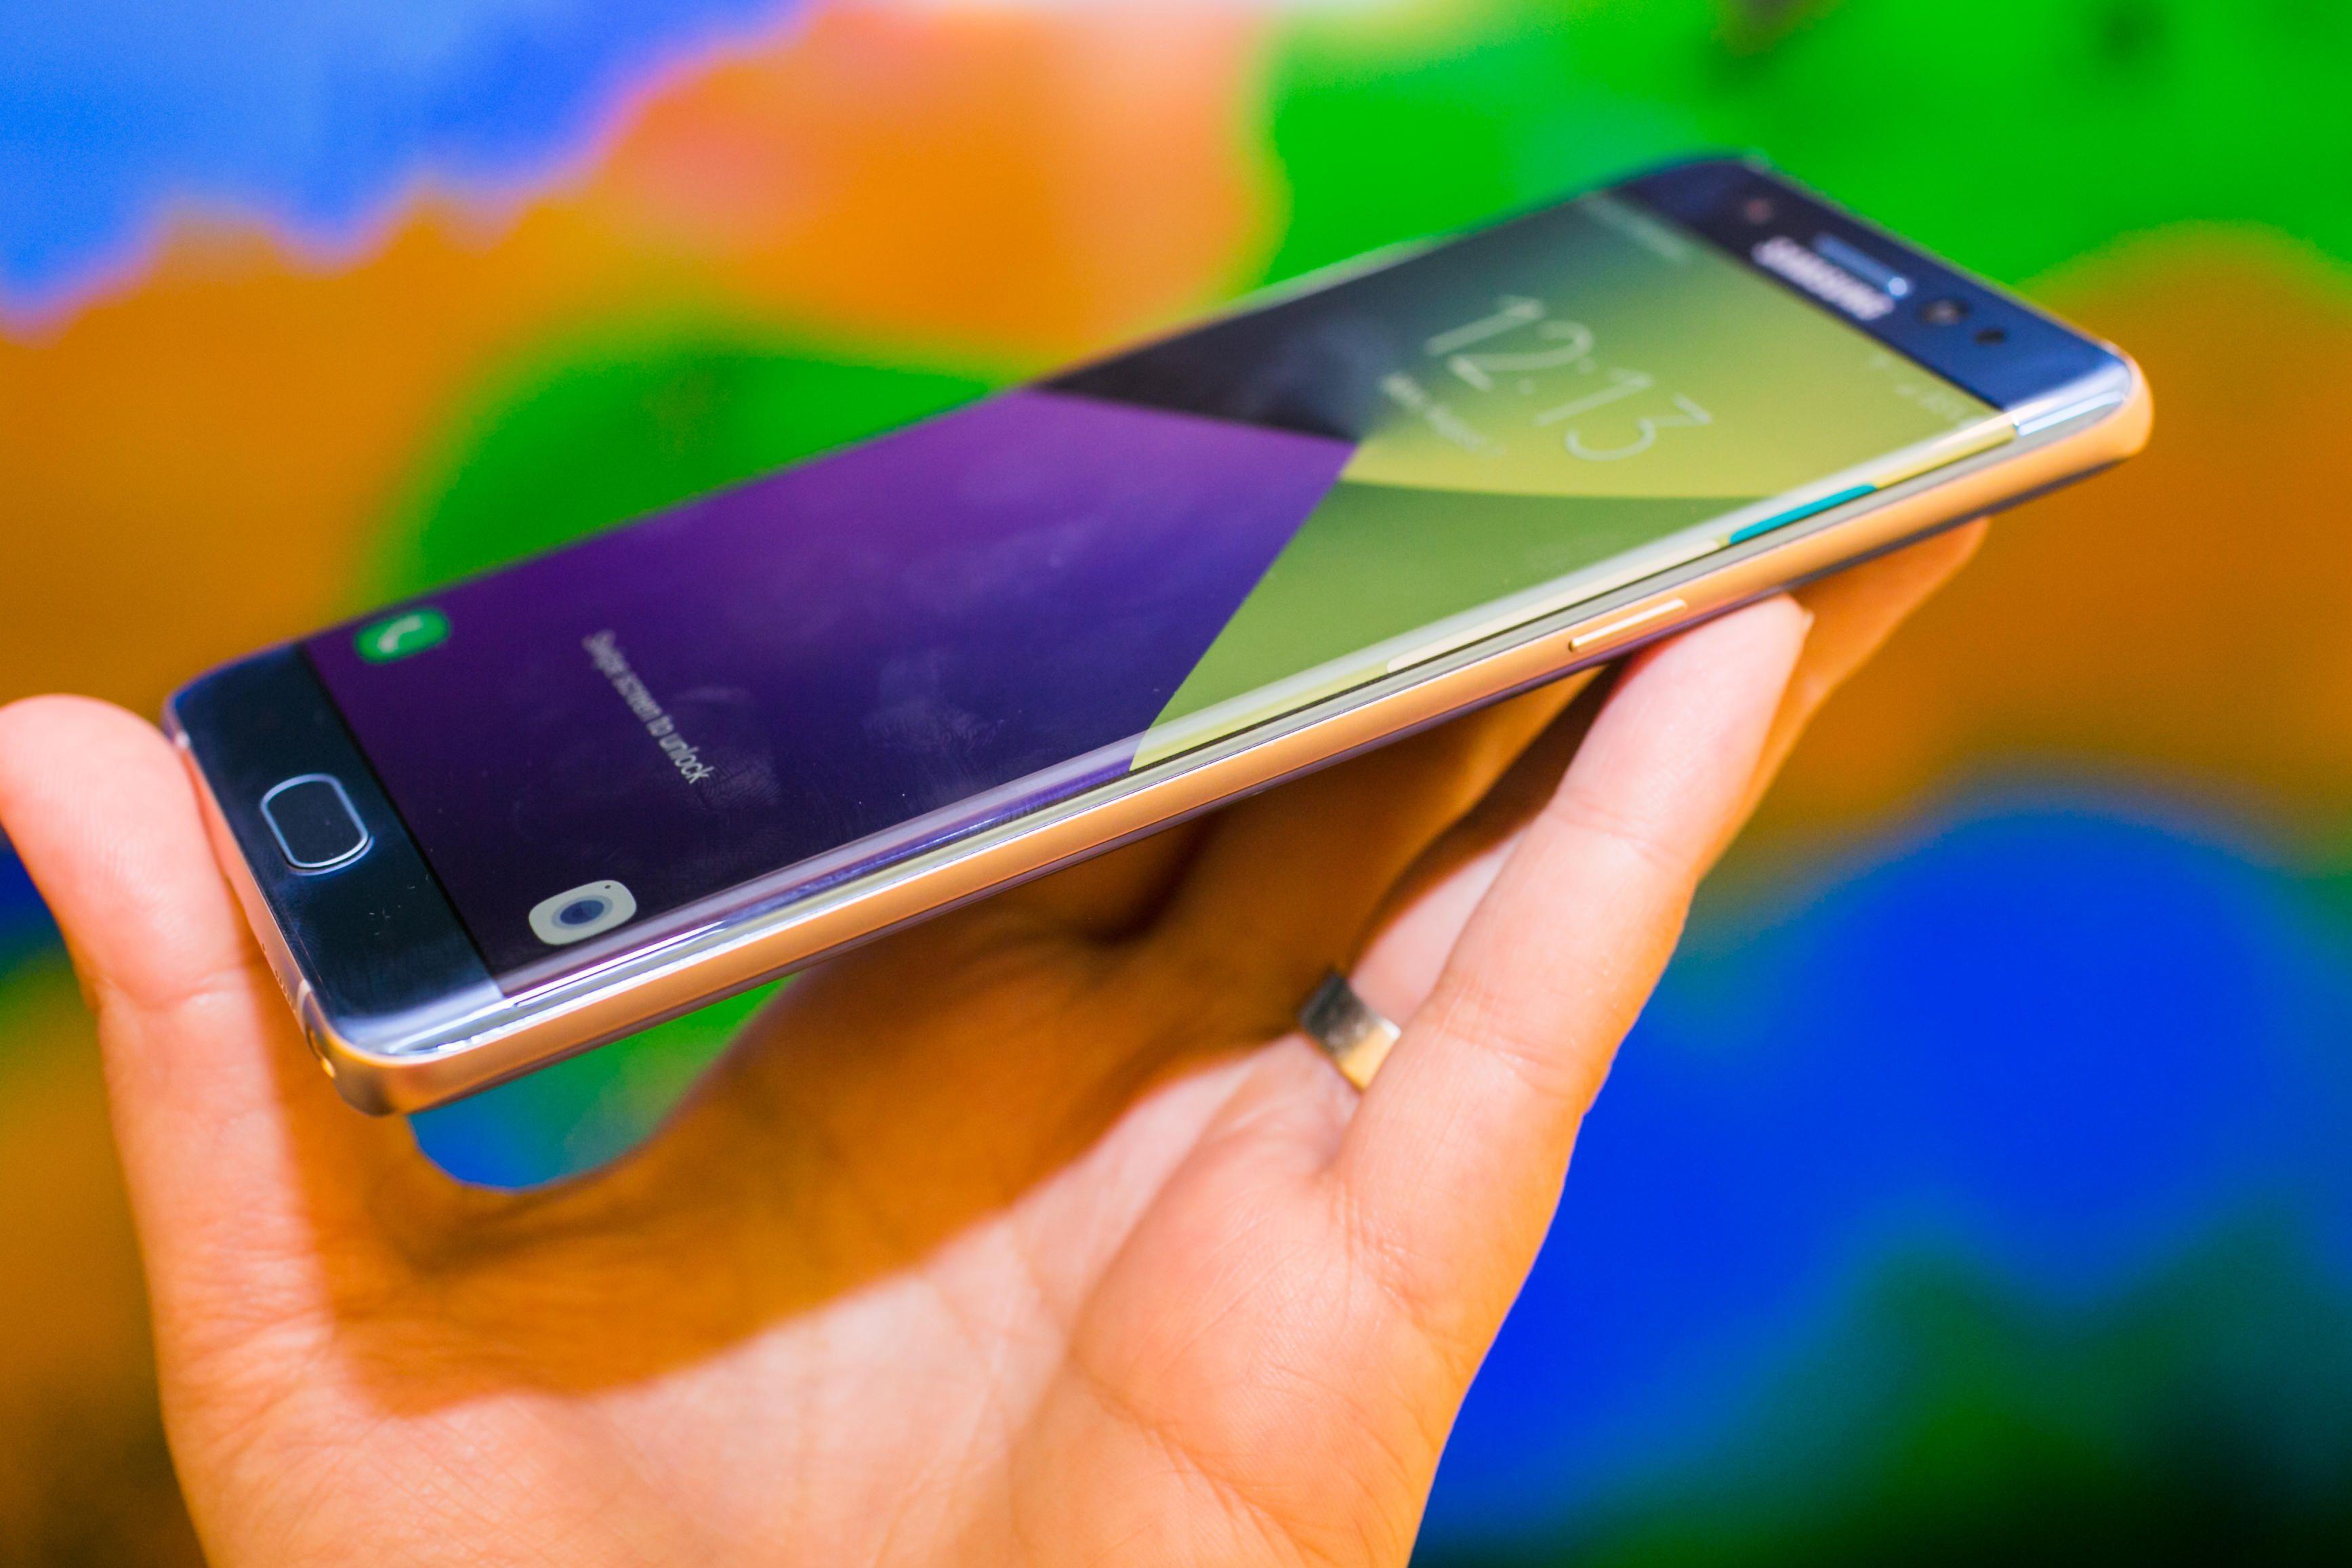 ¿Tendrá el S8 pantalla curva?